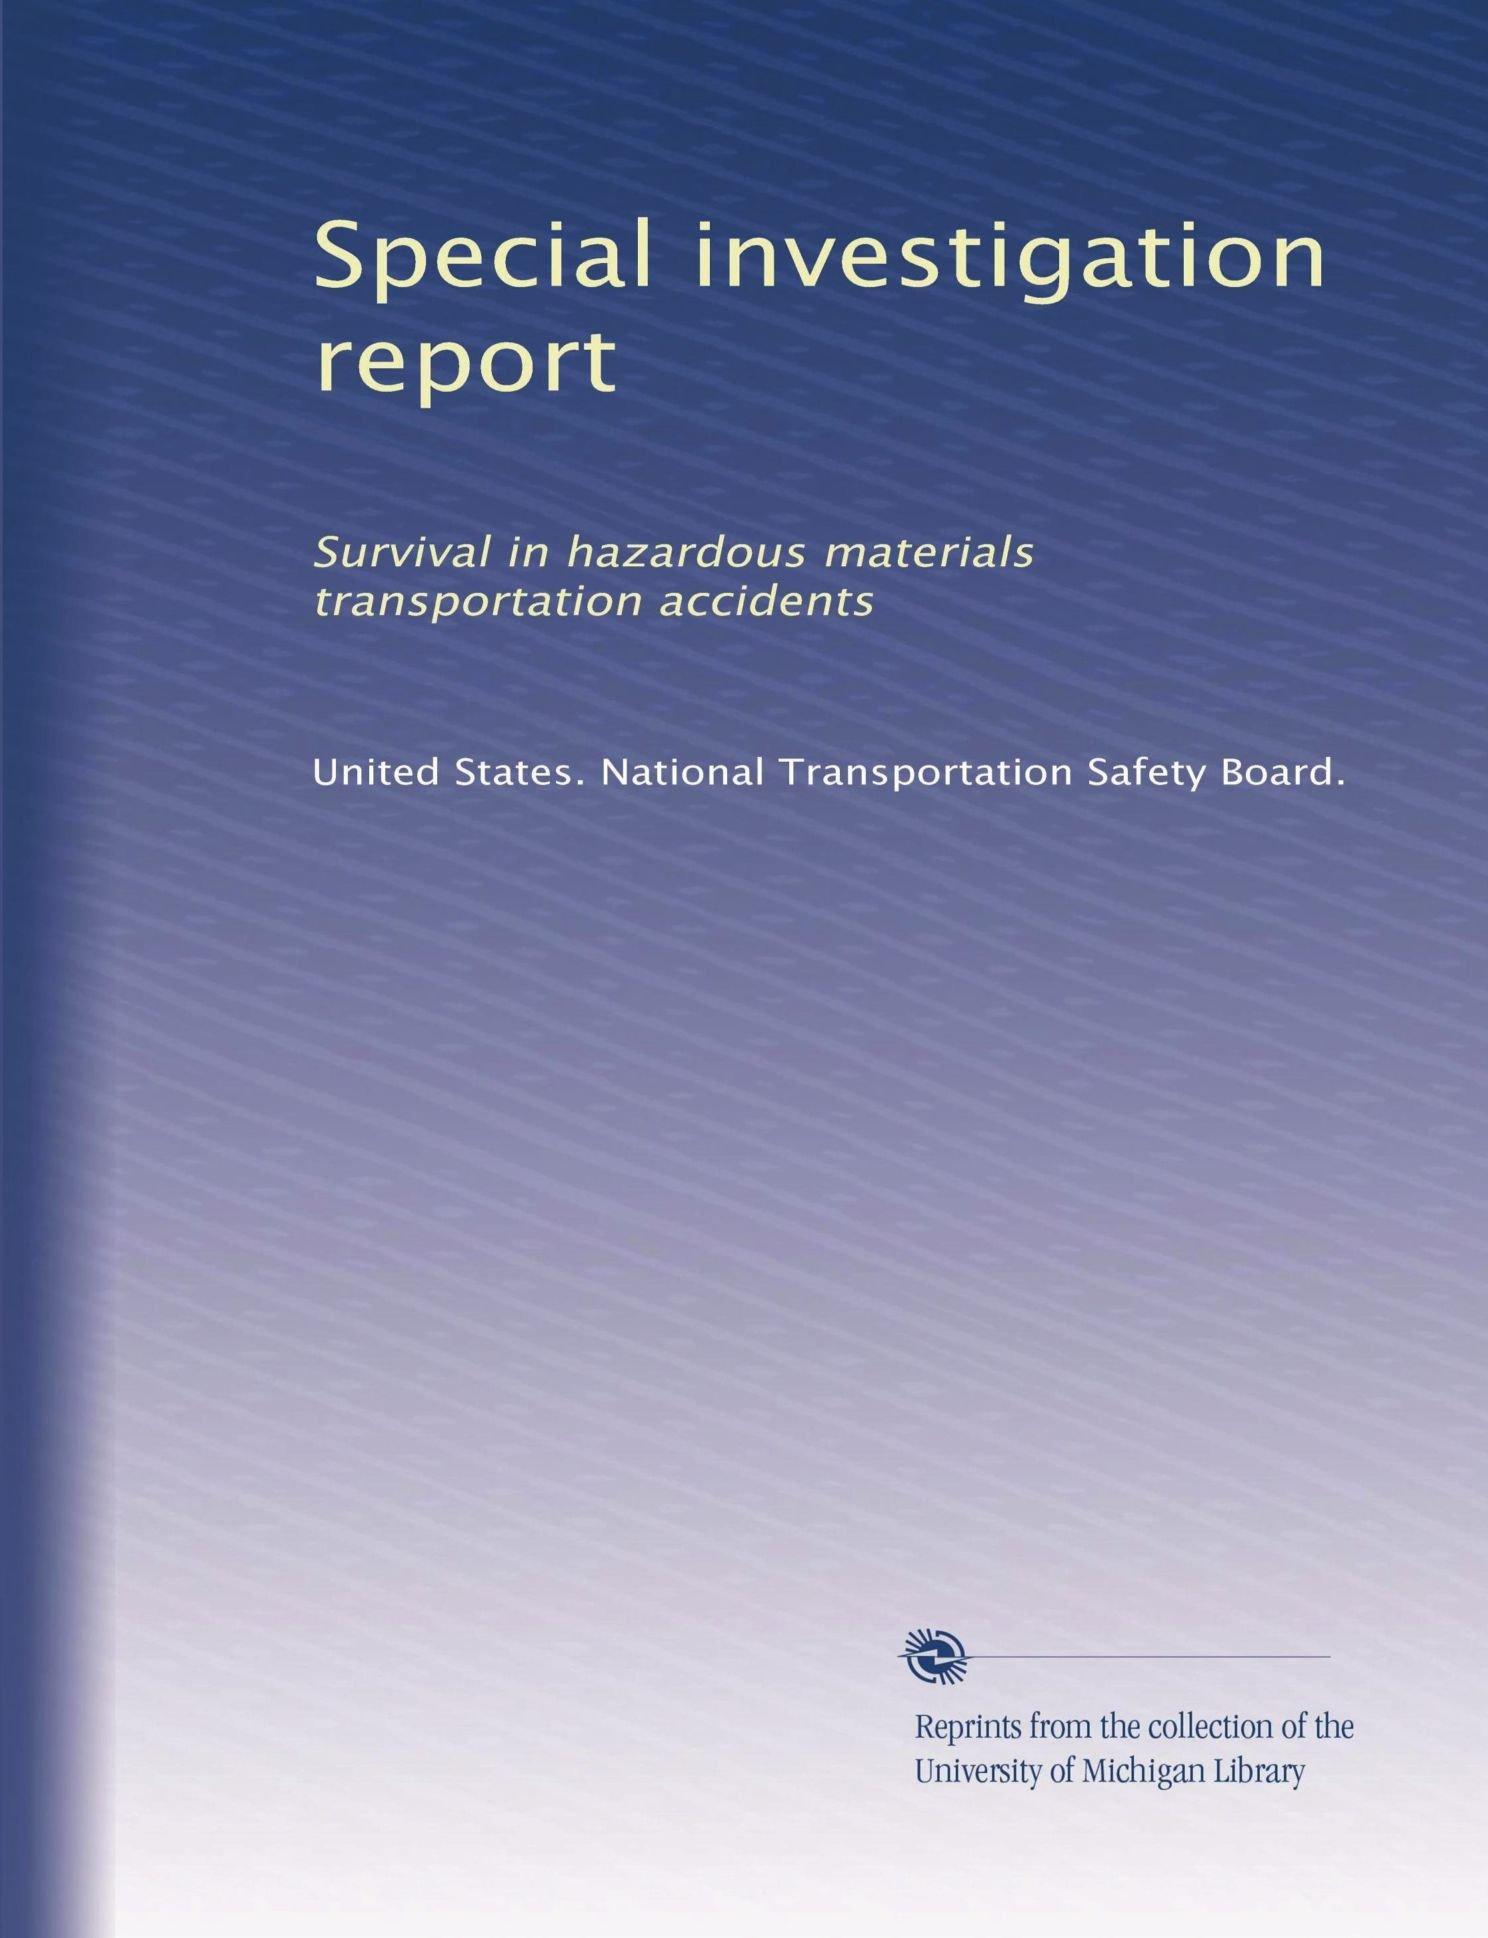 Special investigation report: Survival in hazardous